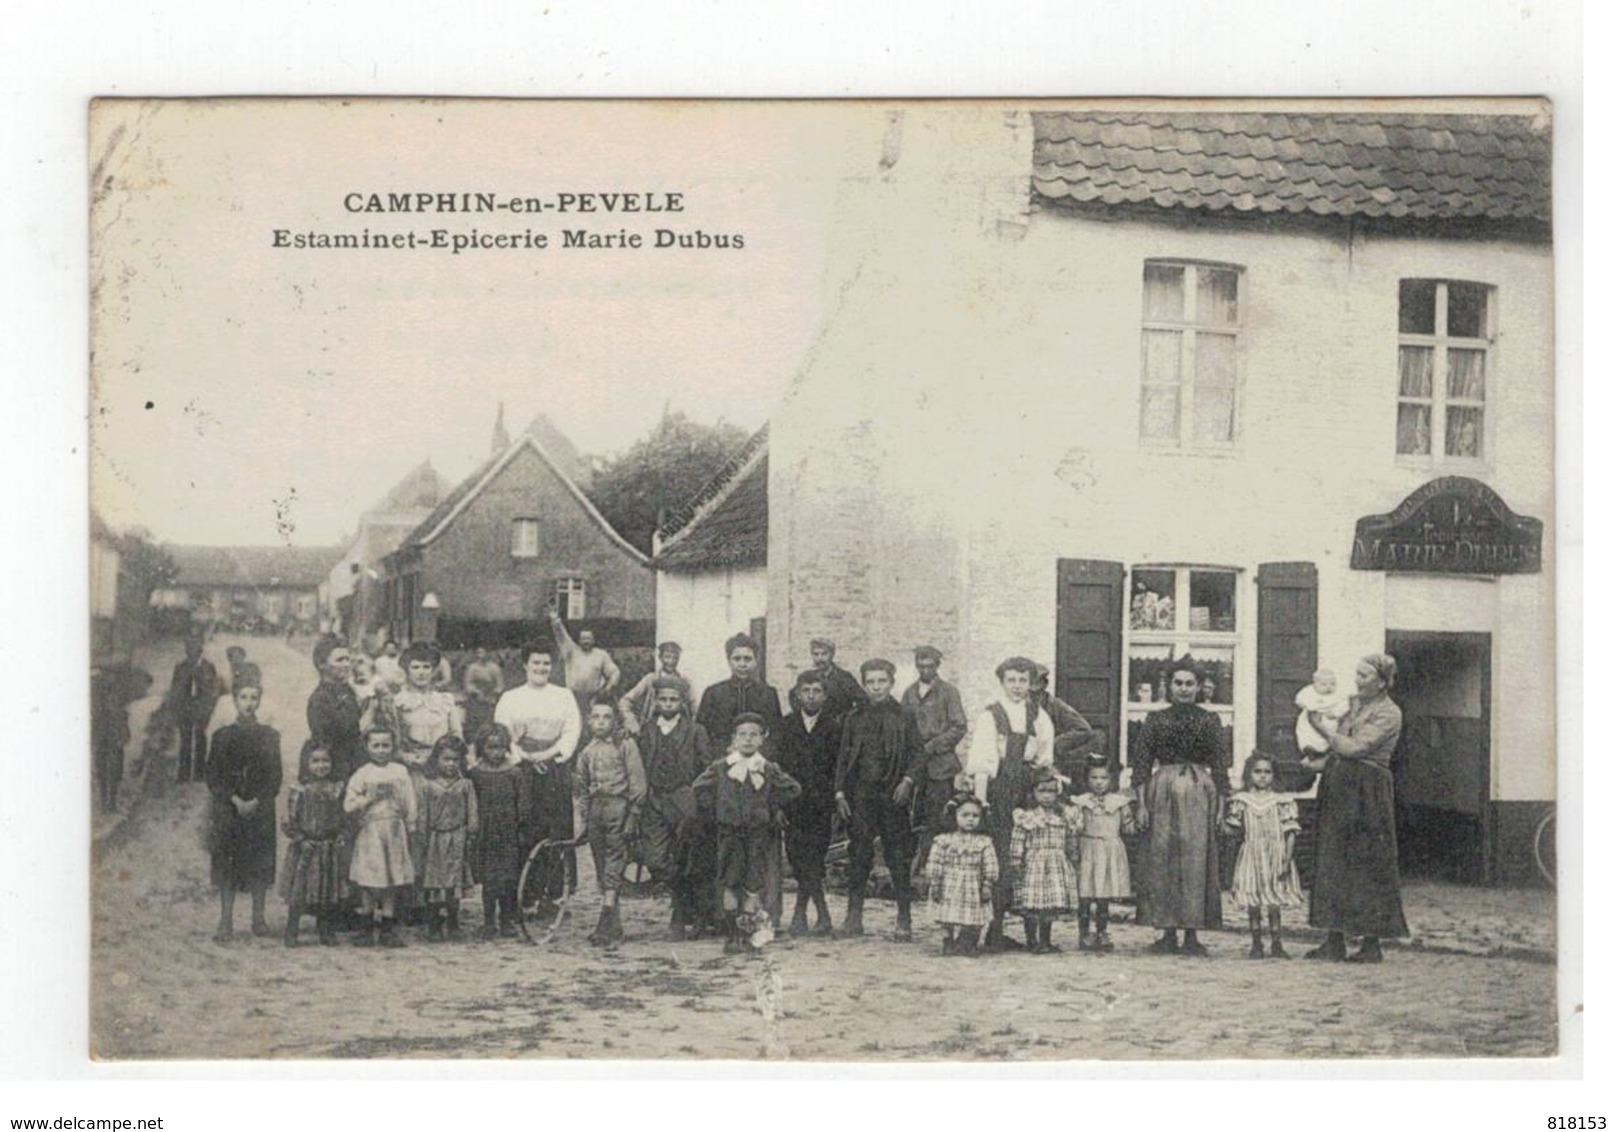 CAMPHIN-en-PEVELE   Estaminet-Epicerie Dubus 1911 - France